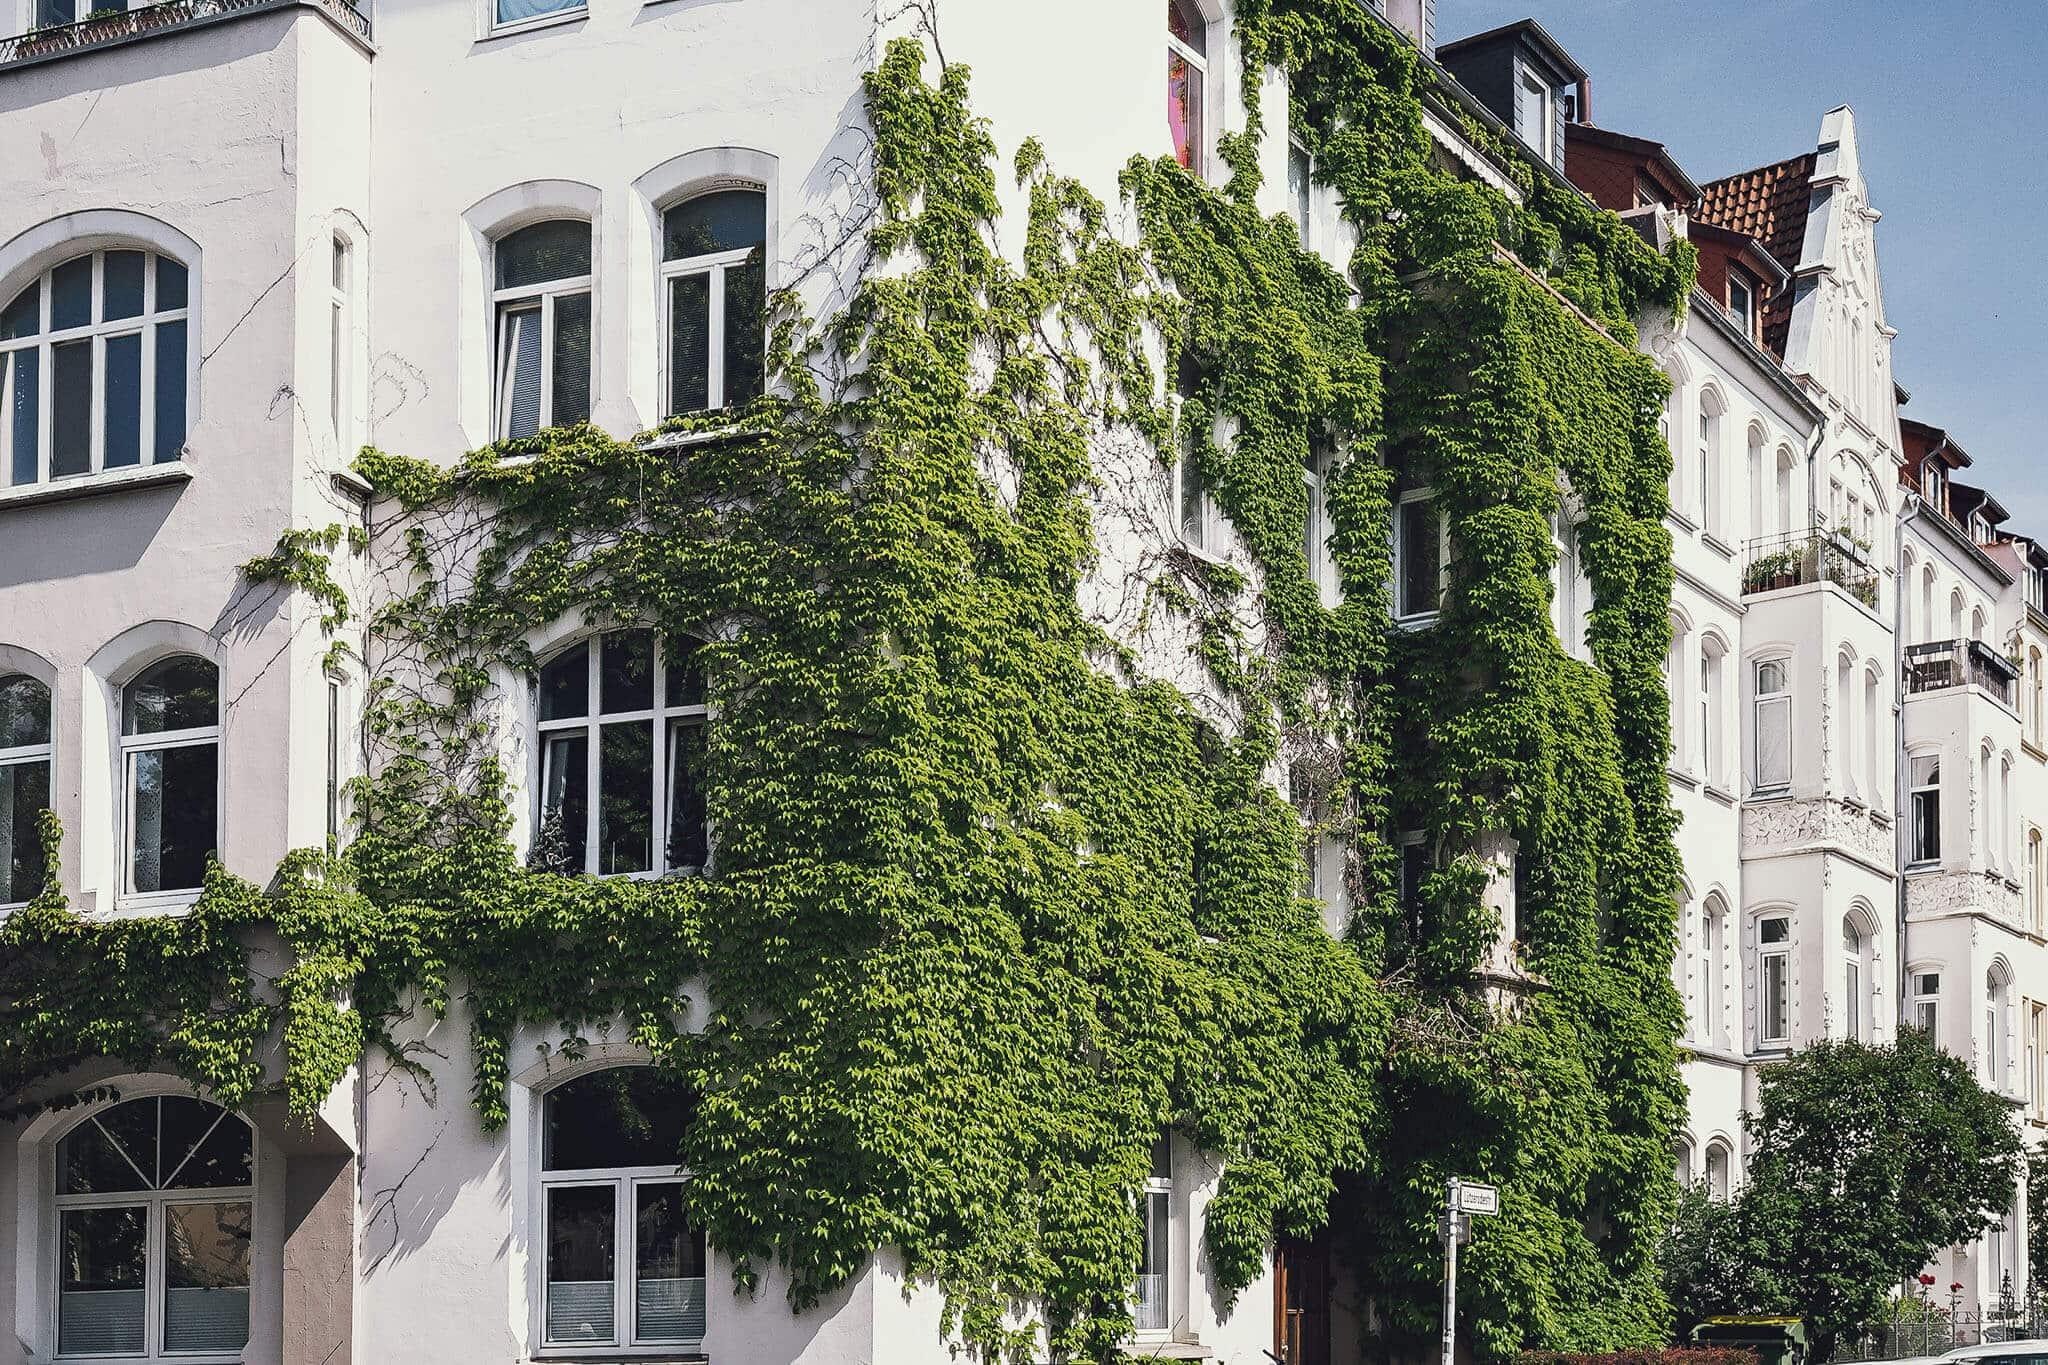 Lützerodestraße - Grüne Stadt Hannover